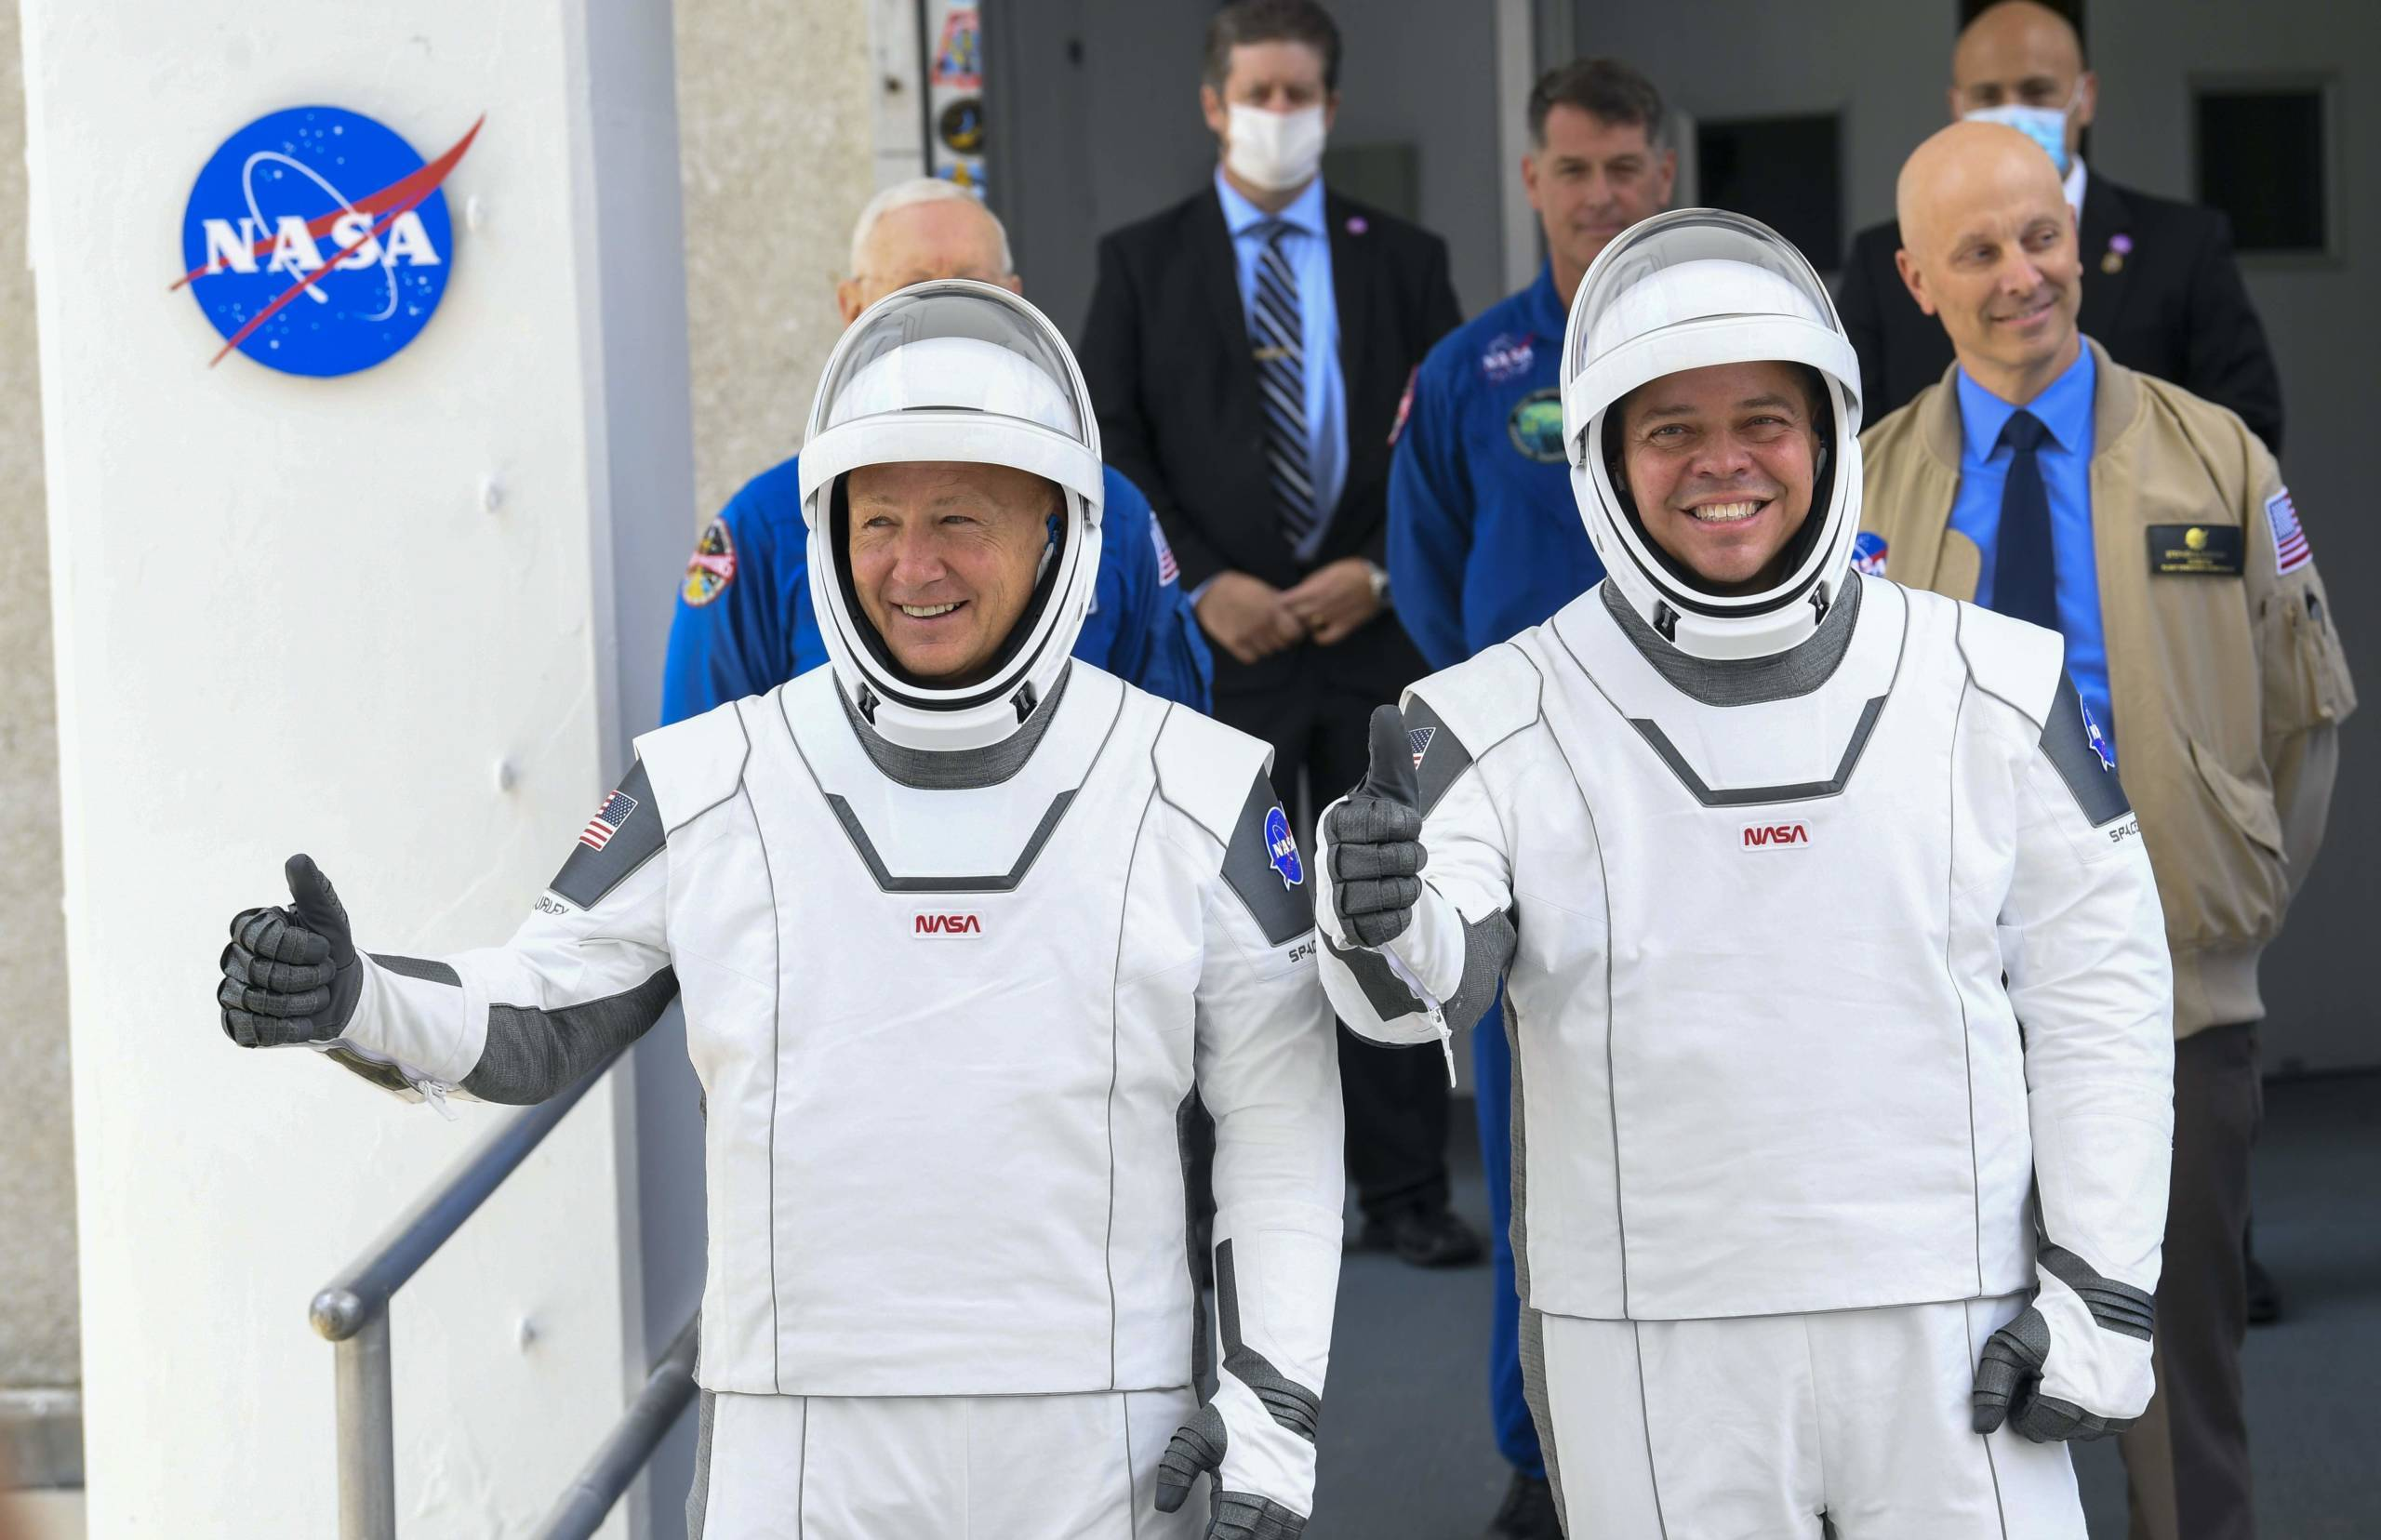 Die beiden Astronauten Doug Hurley (l) und Bob Behnken vor dem Launch